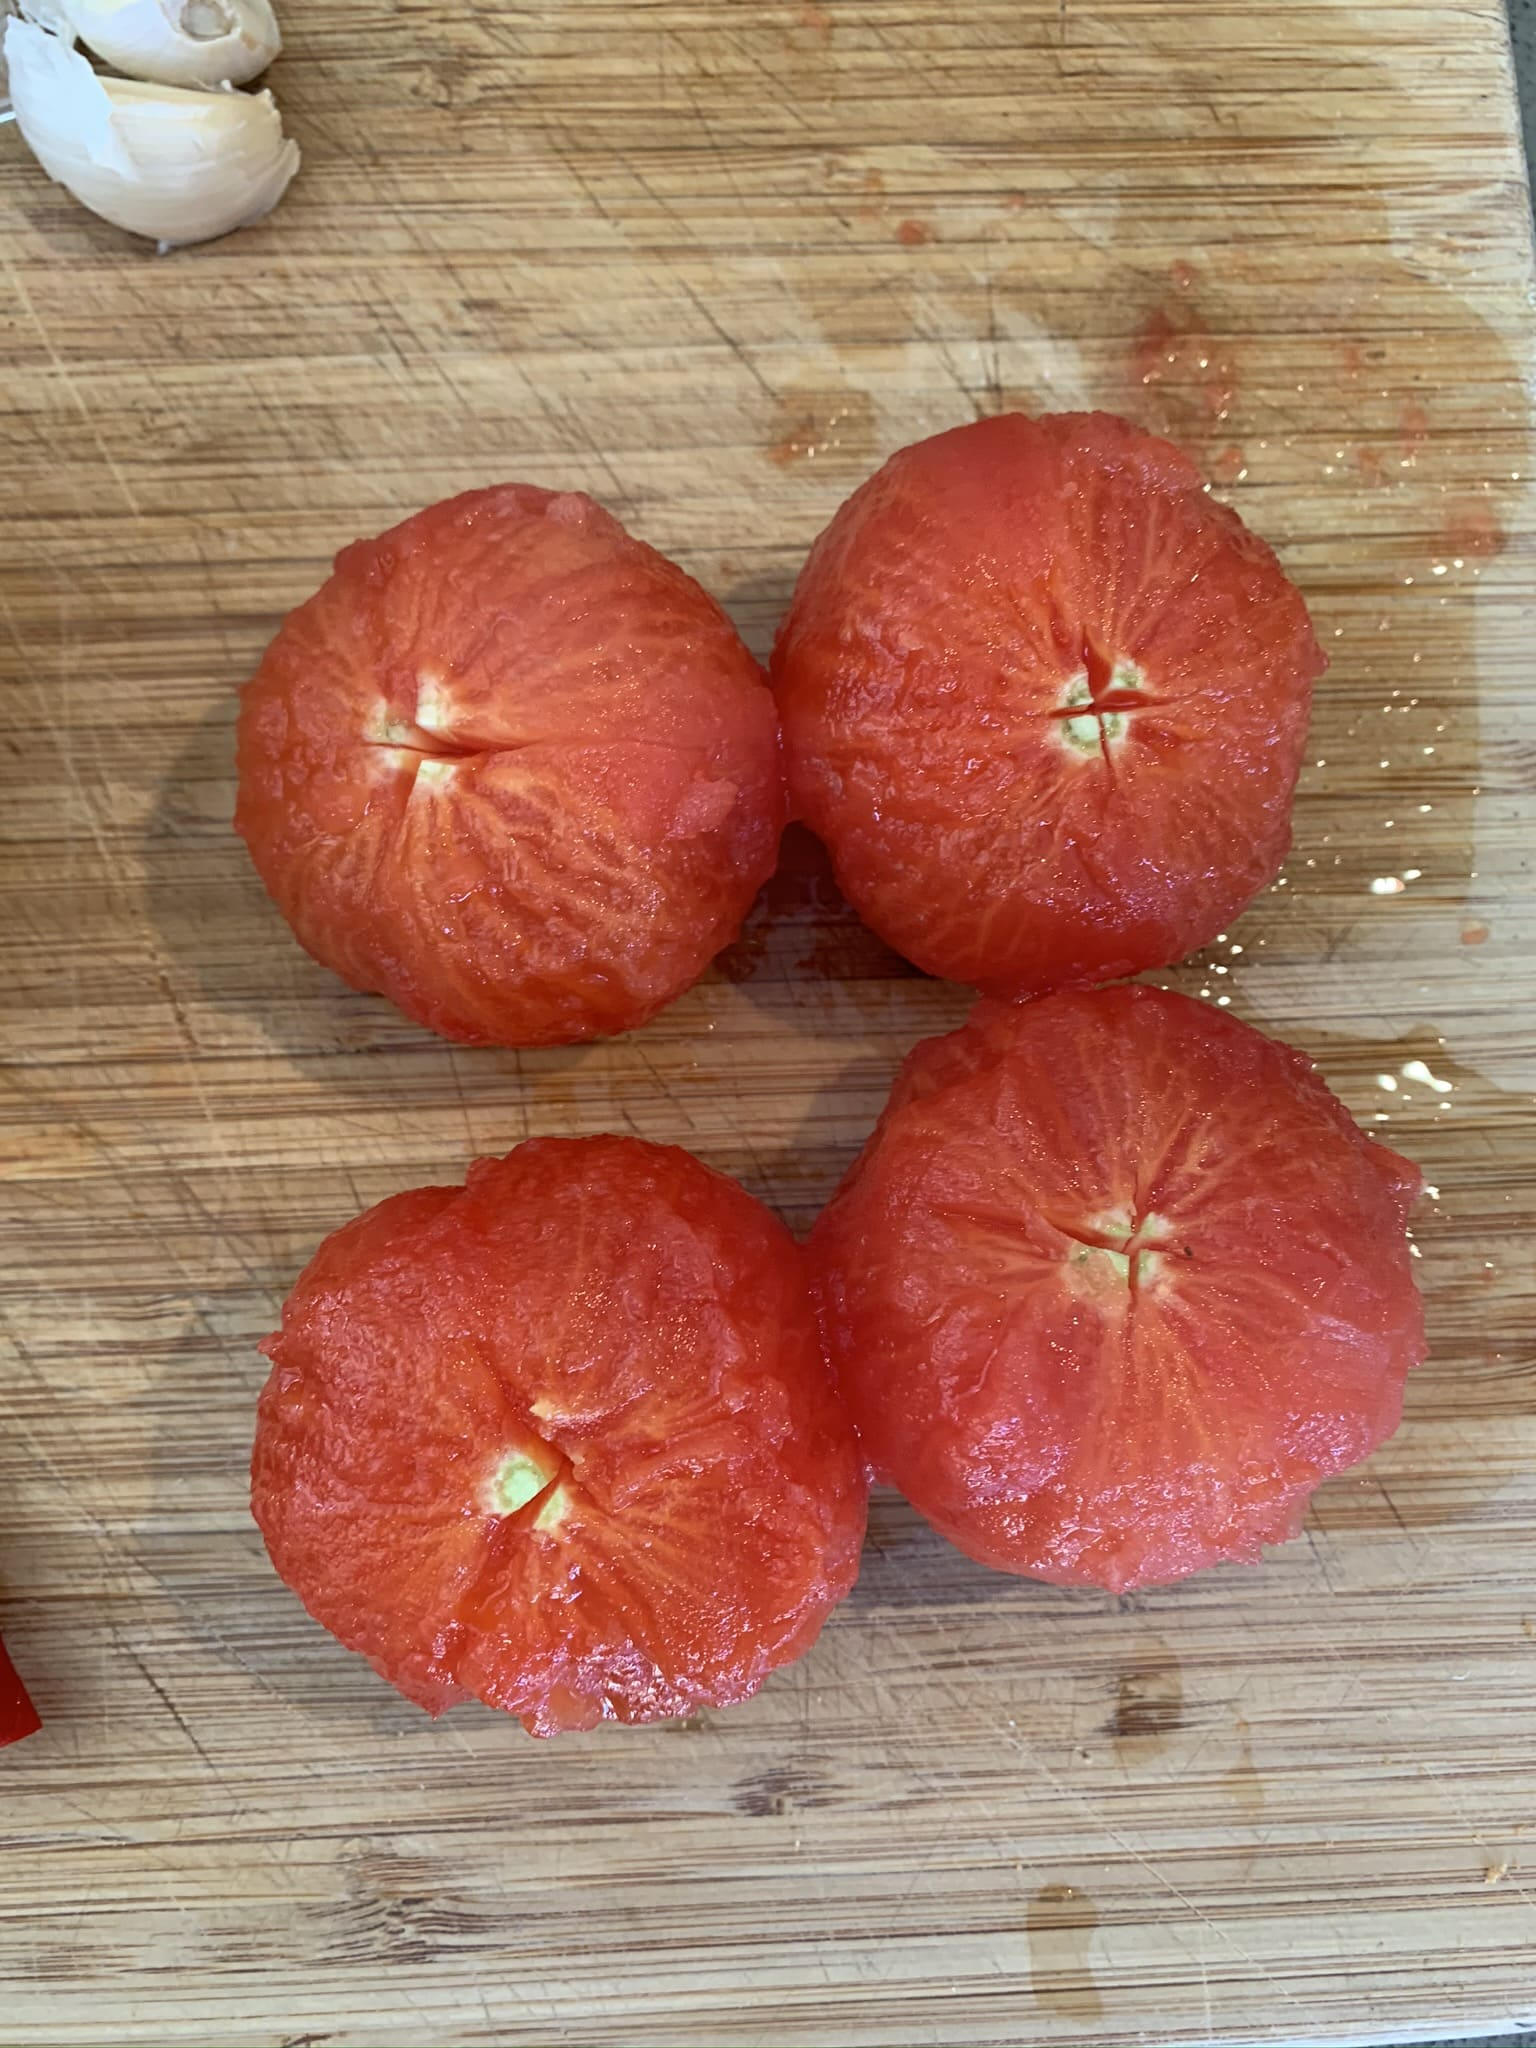 Hoe ontvel je tomaten?